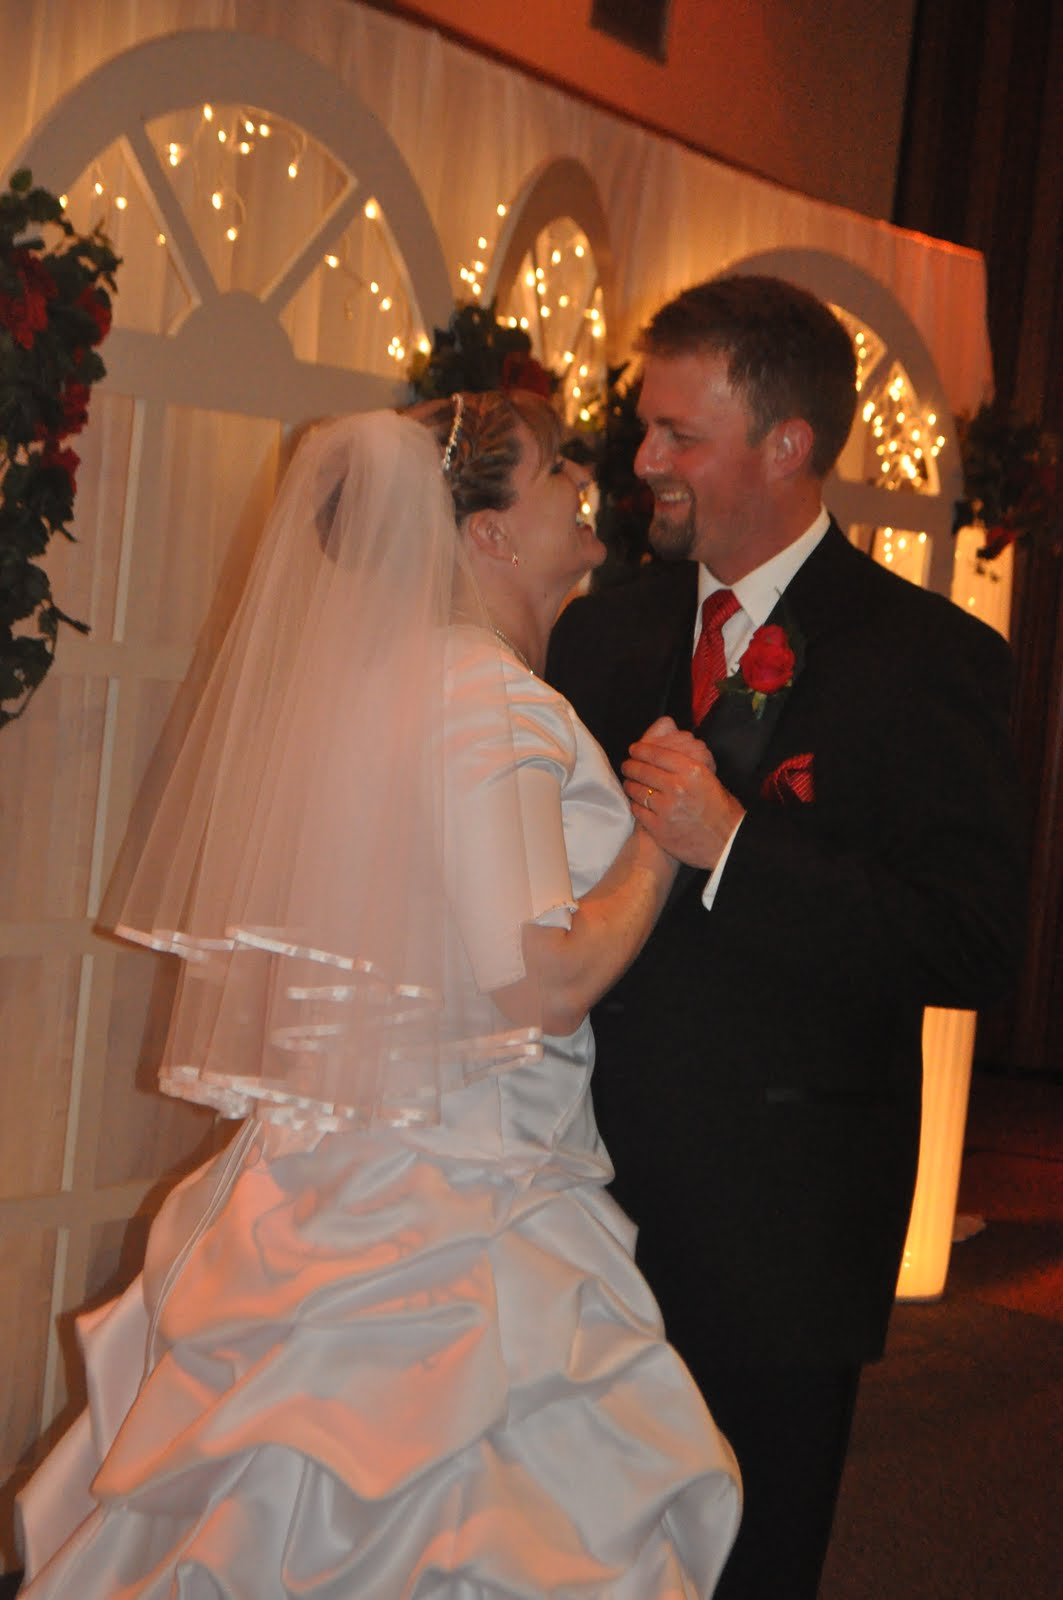 http://1.bp.blogspot.com/_iN8nY_Avlk0/TBampZNbwkI/AAAAAAAAAP4/HR8gkXHGuvI/s1600/wedding+170.jpg